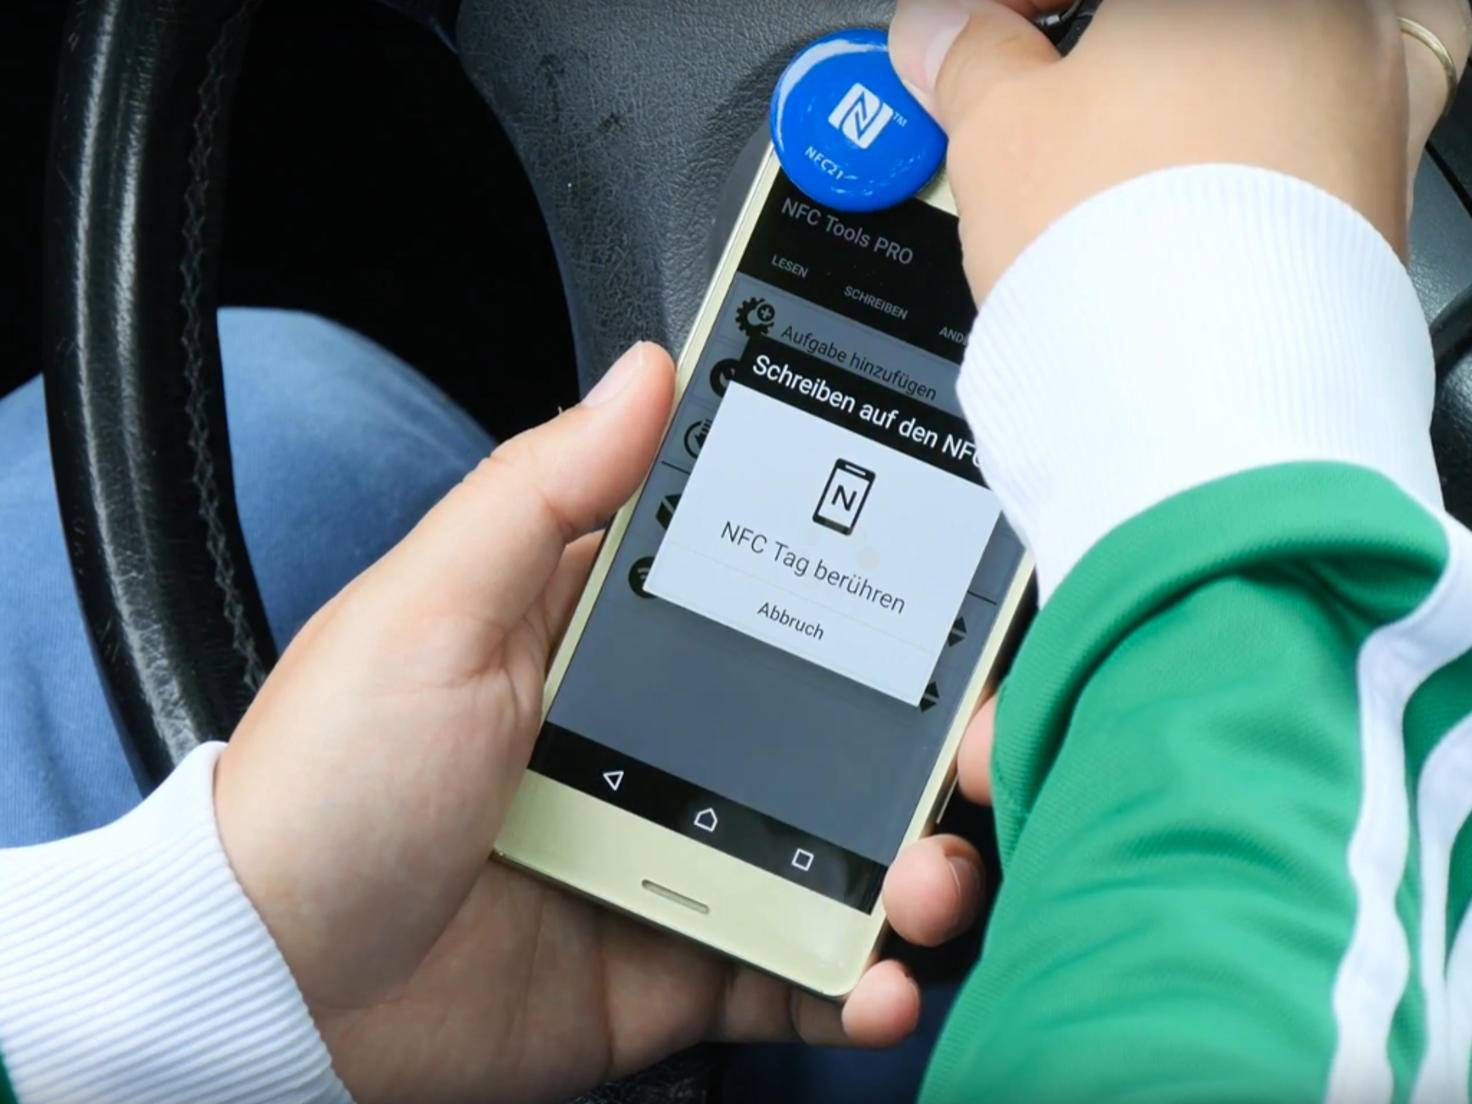 Help NFC-Tags2